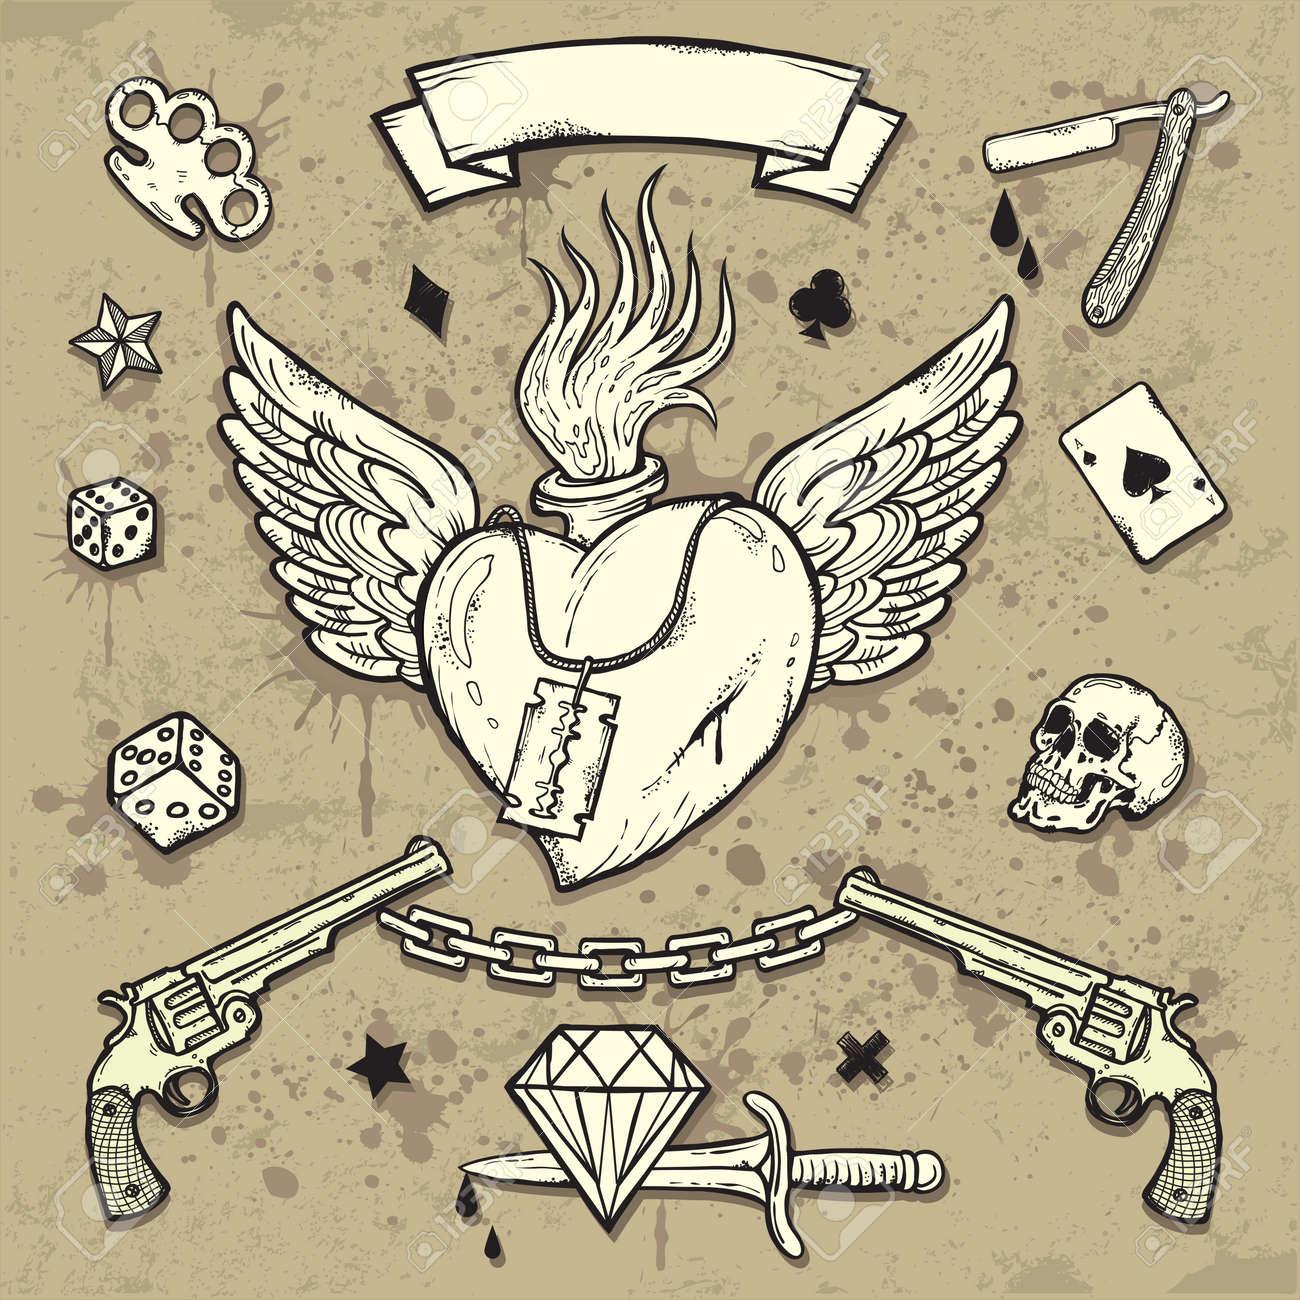 573f019782f41 Set Of Old School Tattoo Elements Royalty Free Cliparts, Vectors ...